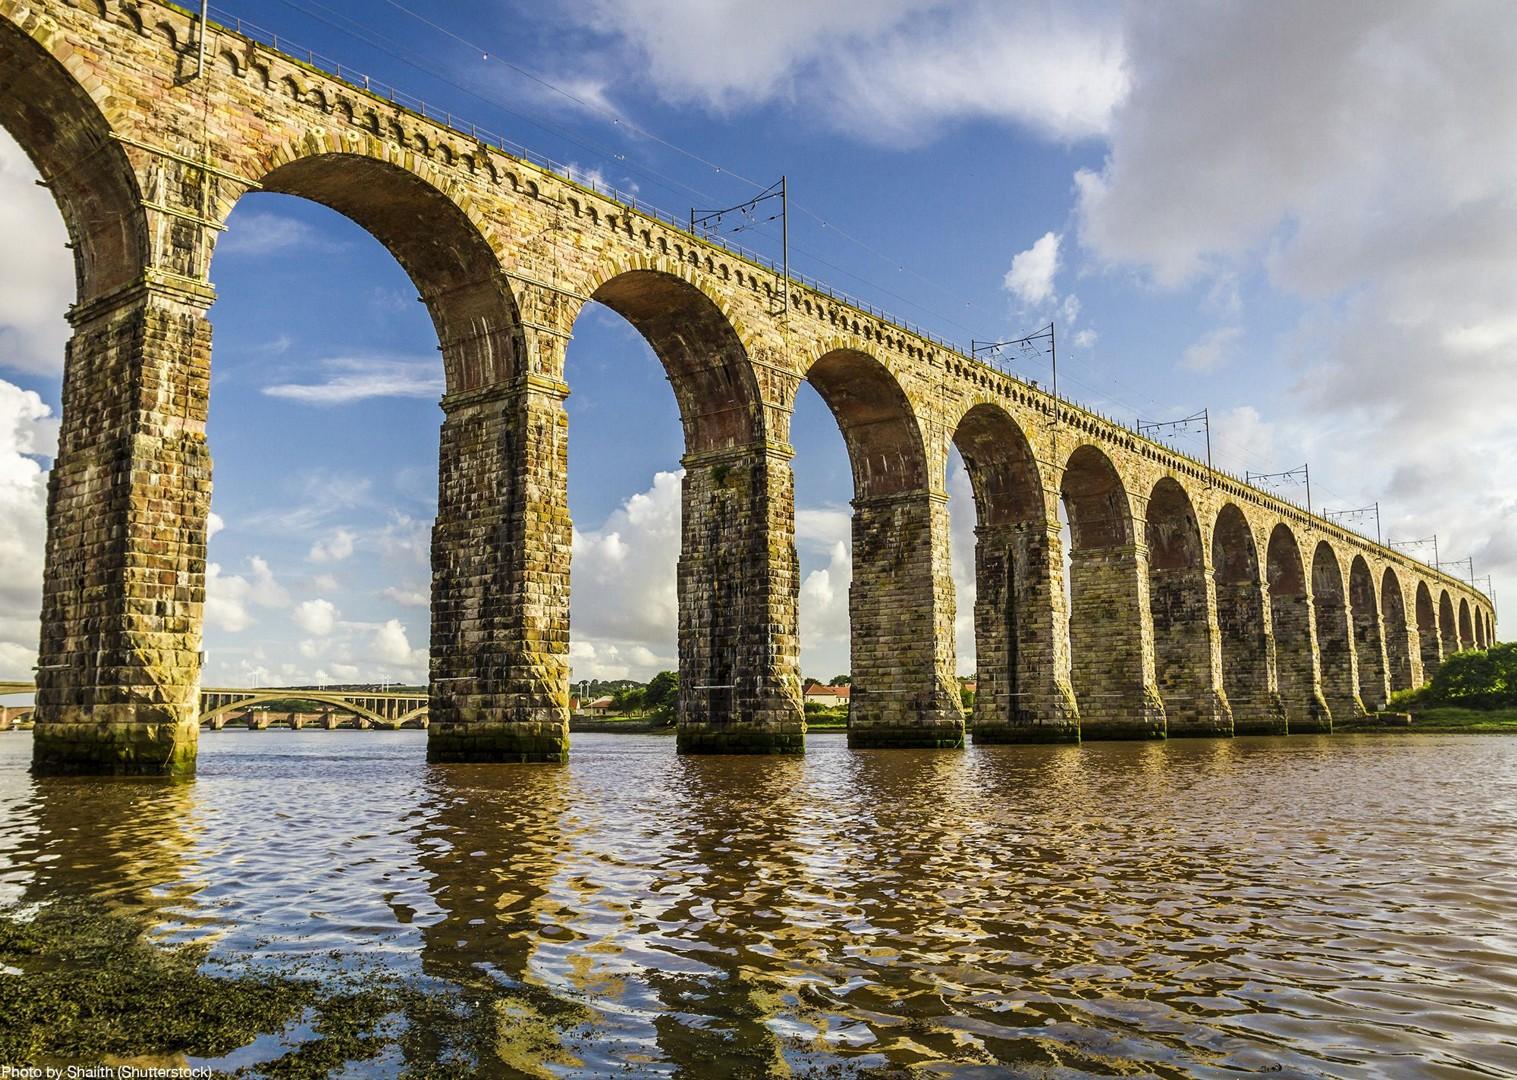 royal-border-bridge-england-northumberland-tour-coast.jpg - UK - Northumberland Coast - 2 Days - Self-Guided Leisure Cycling Holiday - Leisure Cycling